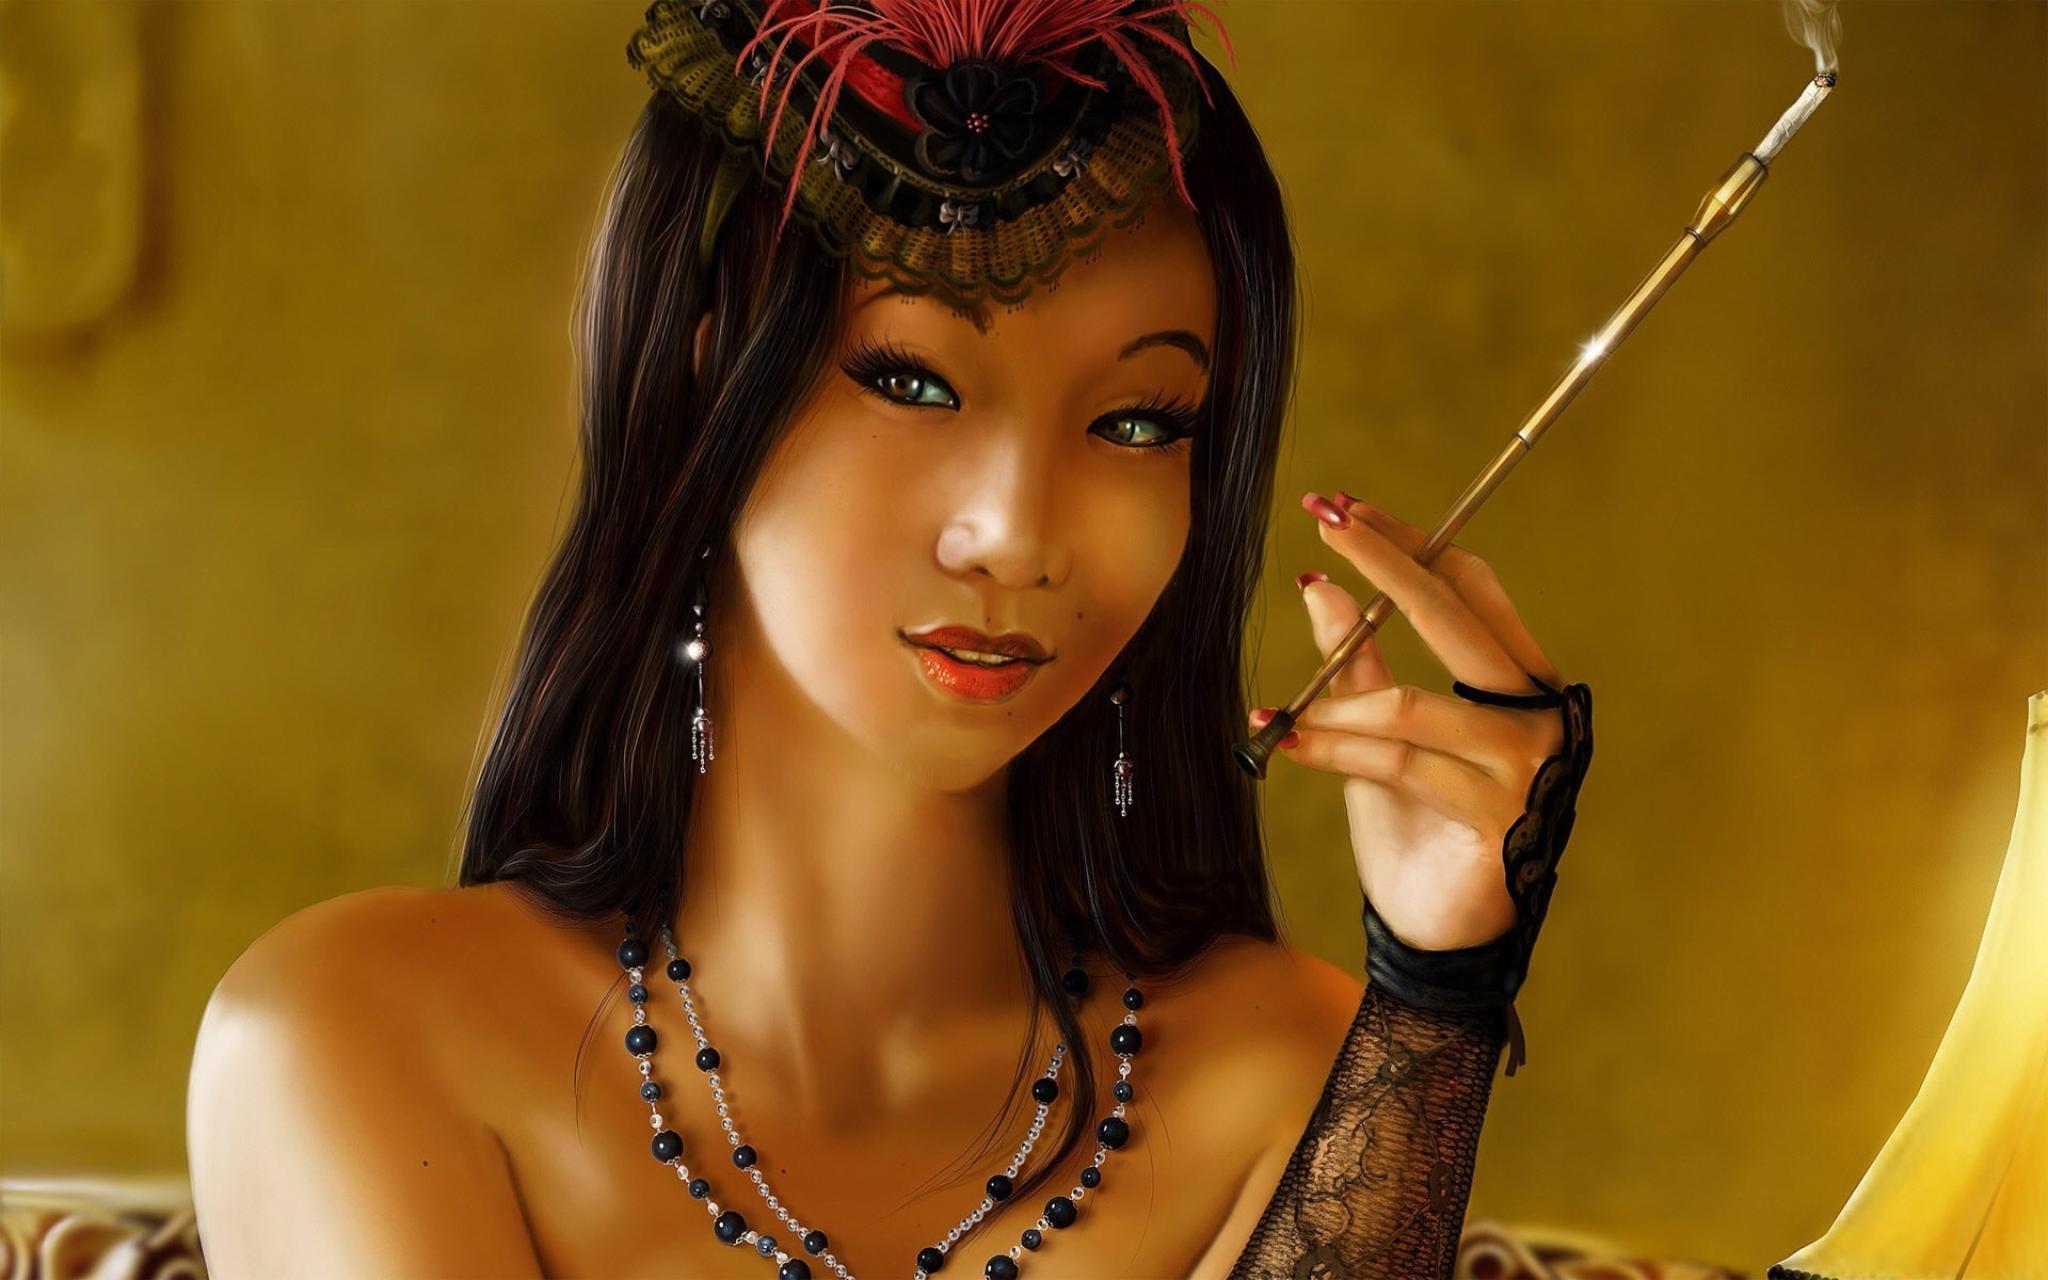 Living room <font><b>home</b></font> wall <font><b>decoration</b></font> fabric poster brunettes long hair <font><b>Asians</b></font> headbands cigarettes faces necklaces open mouth